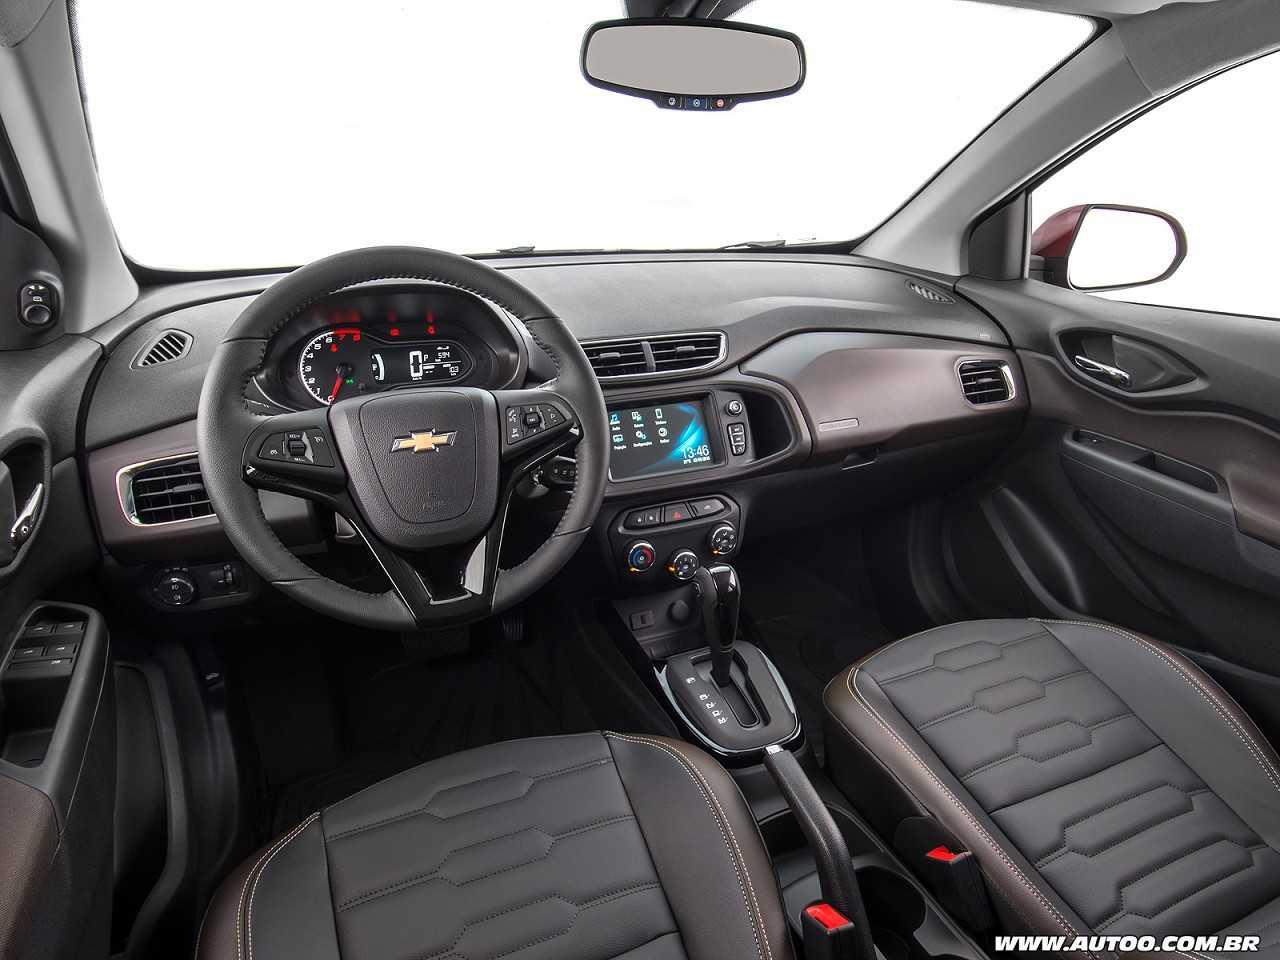 ChevroletPrisma 2019 - painel